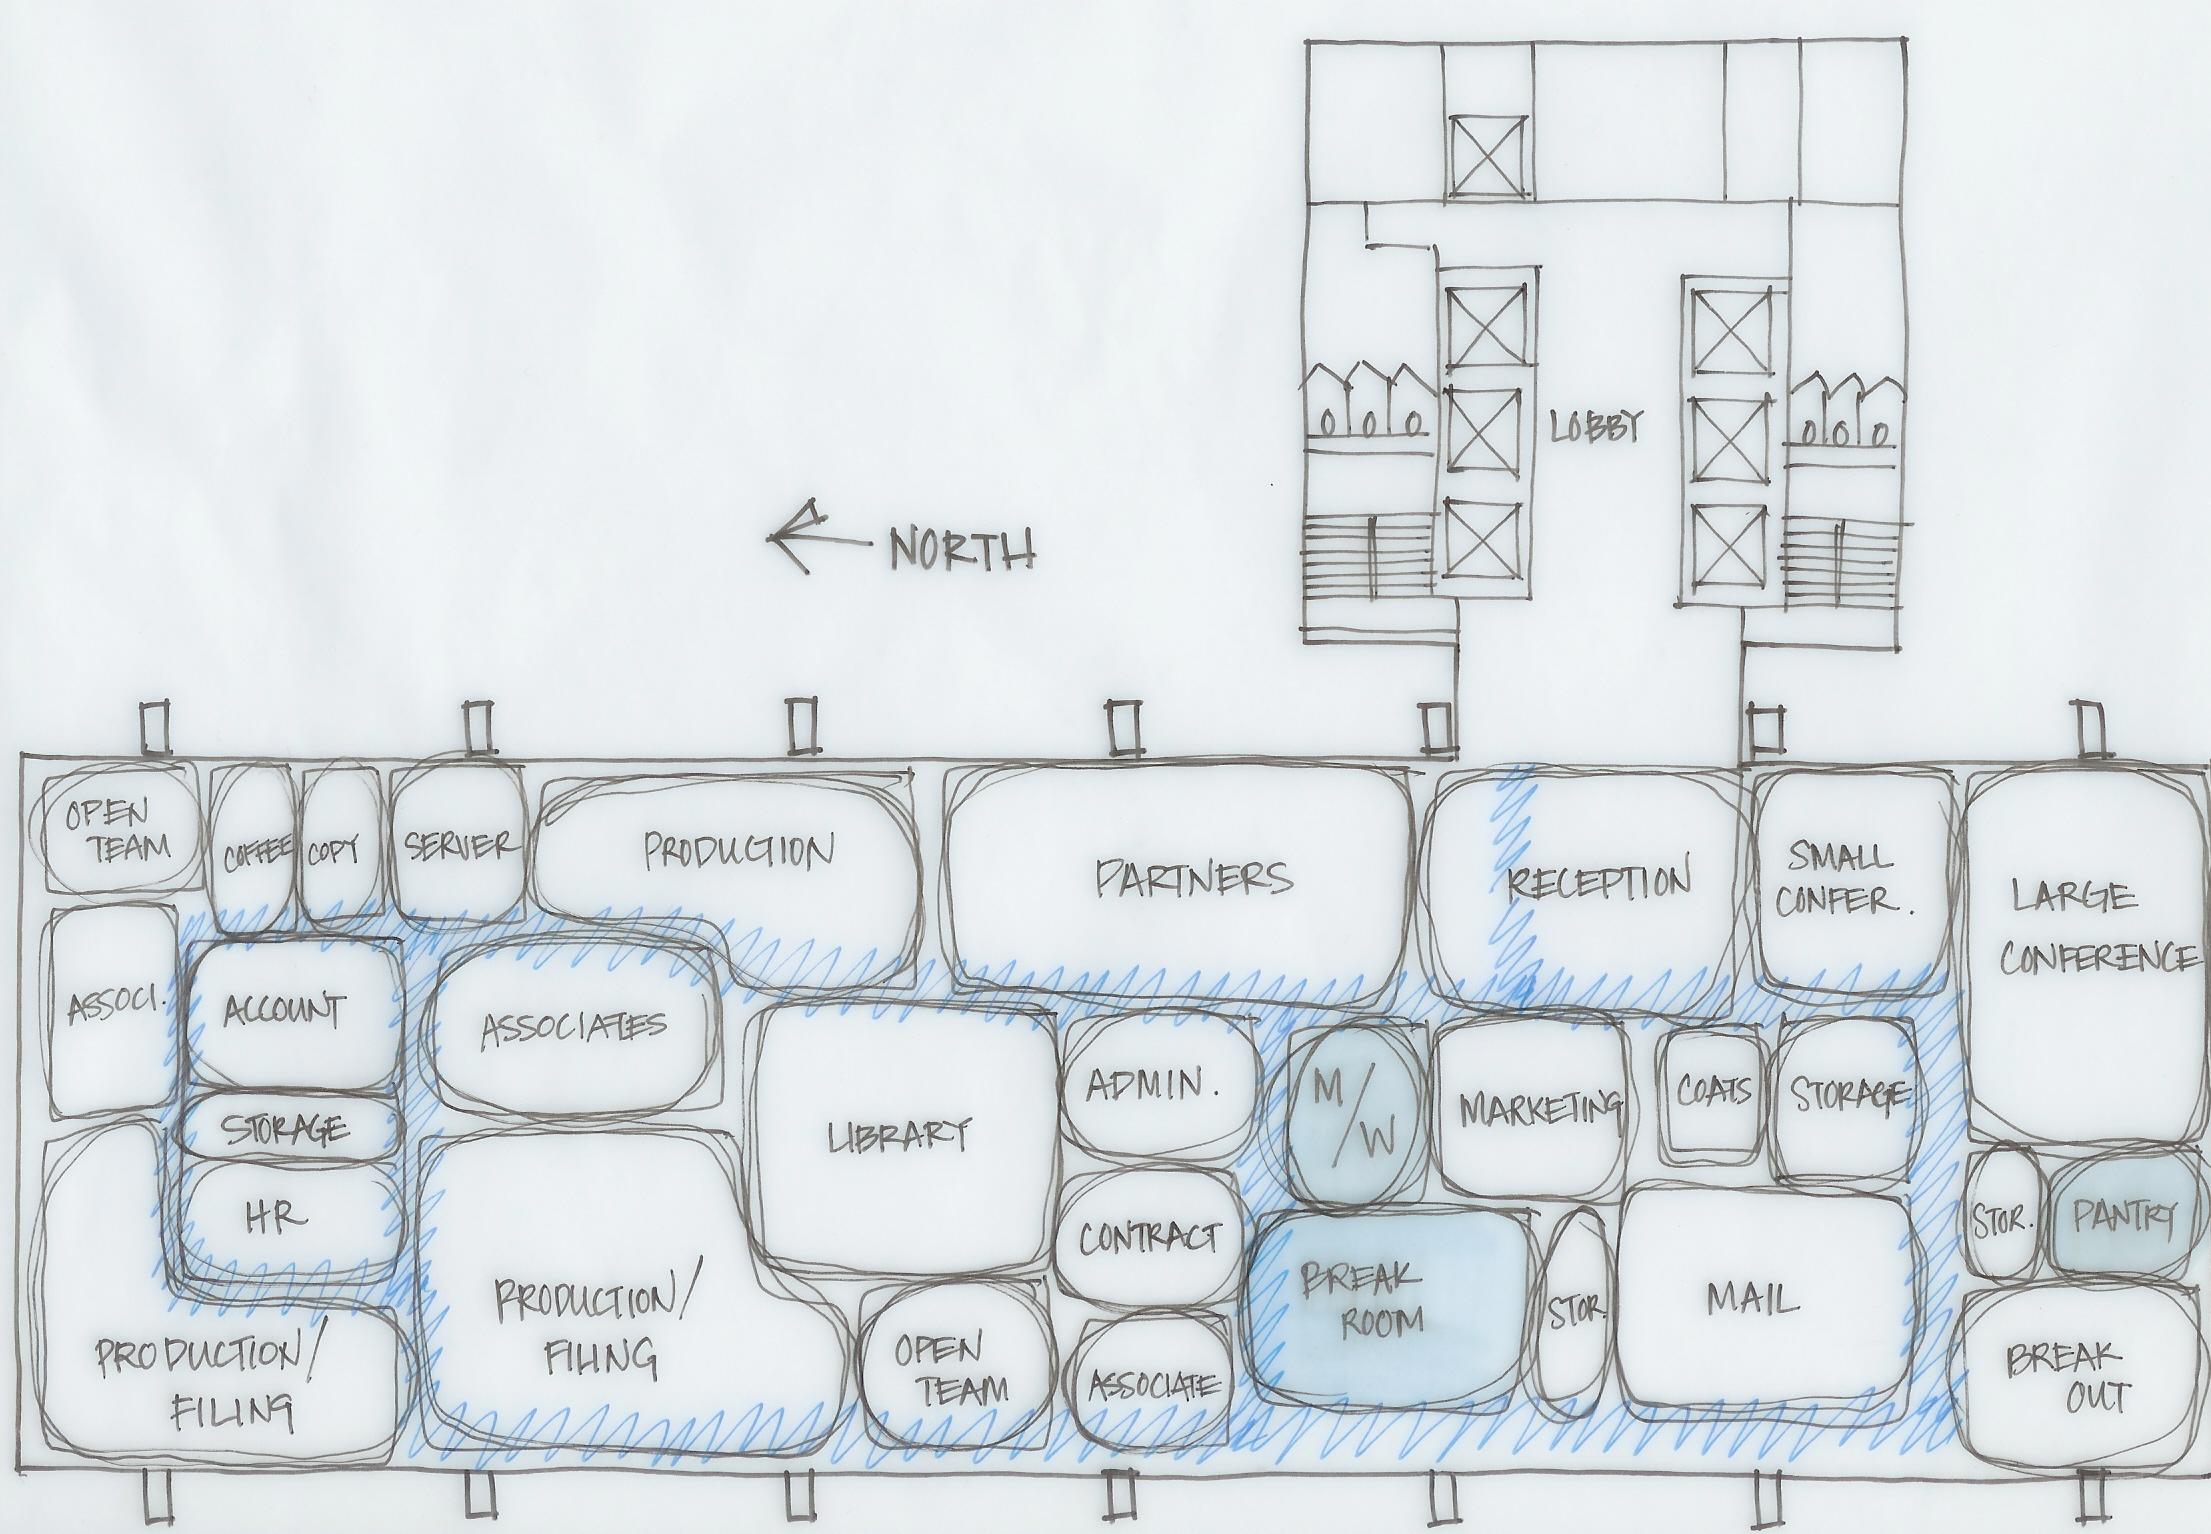 office project by elizabeth dixon at coroflot com